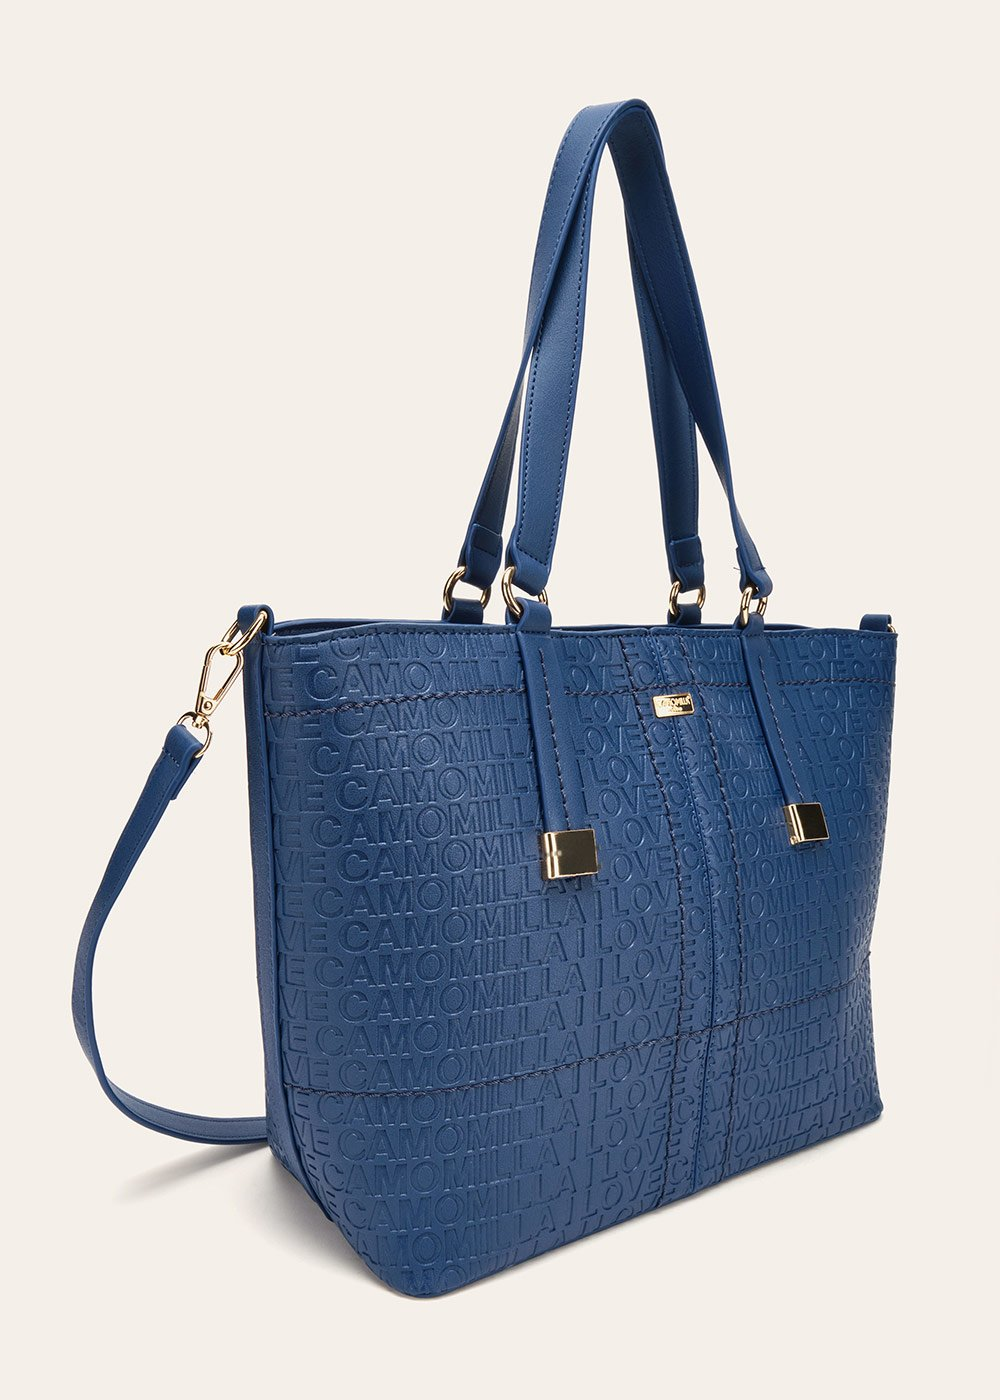 Berry logomania shopping bag - Ultramarine - Woman